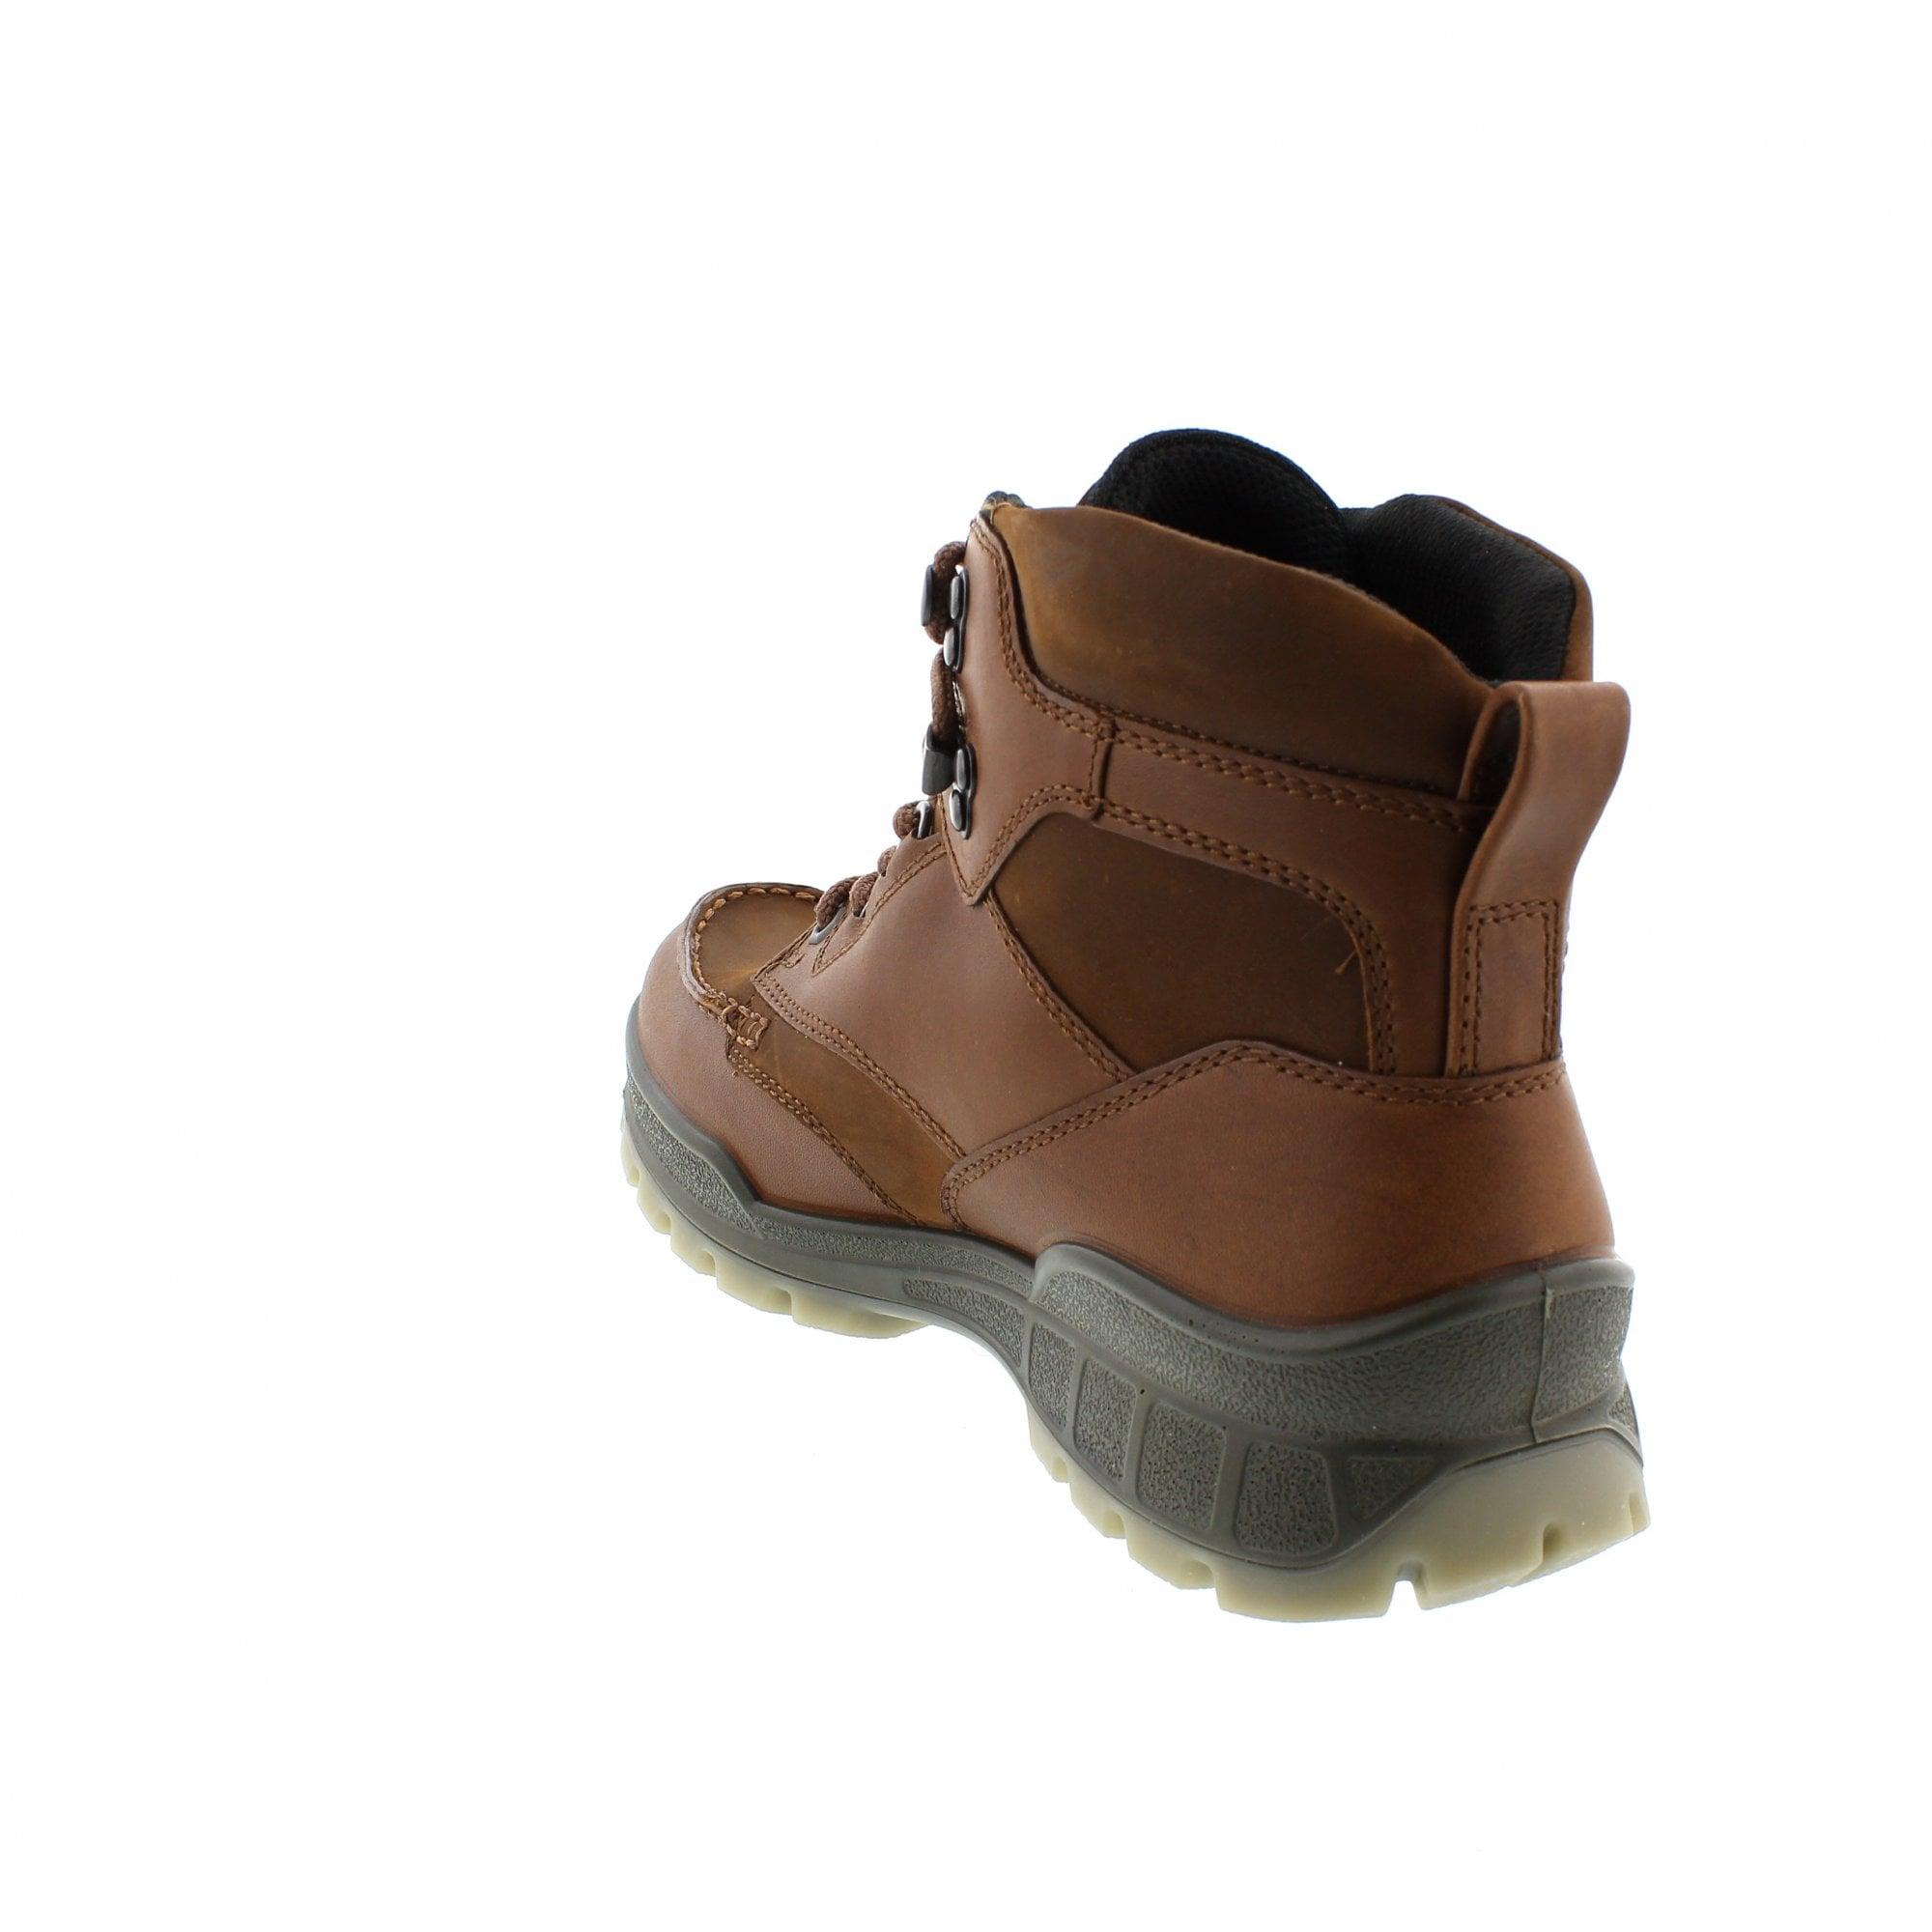 Boots Chaussures Track Sacs 001954 Ecco Bottes Et 00741 Ii 5R3L4Aj